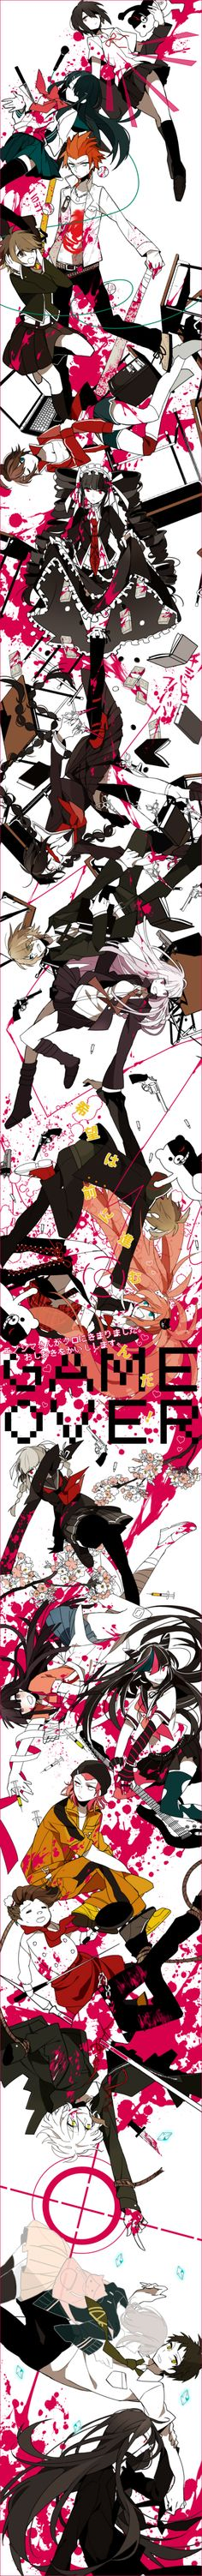 Can't believe they forgot my love Koizumi but hey, I like Kigiri, Hinata & co